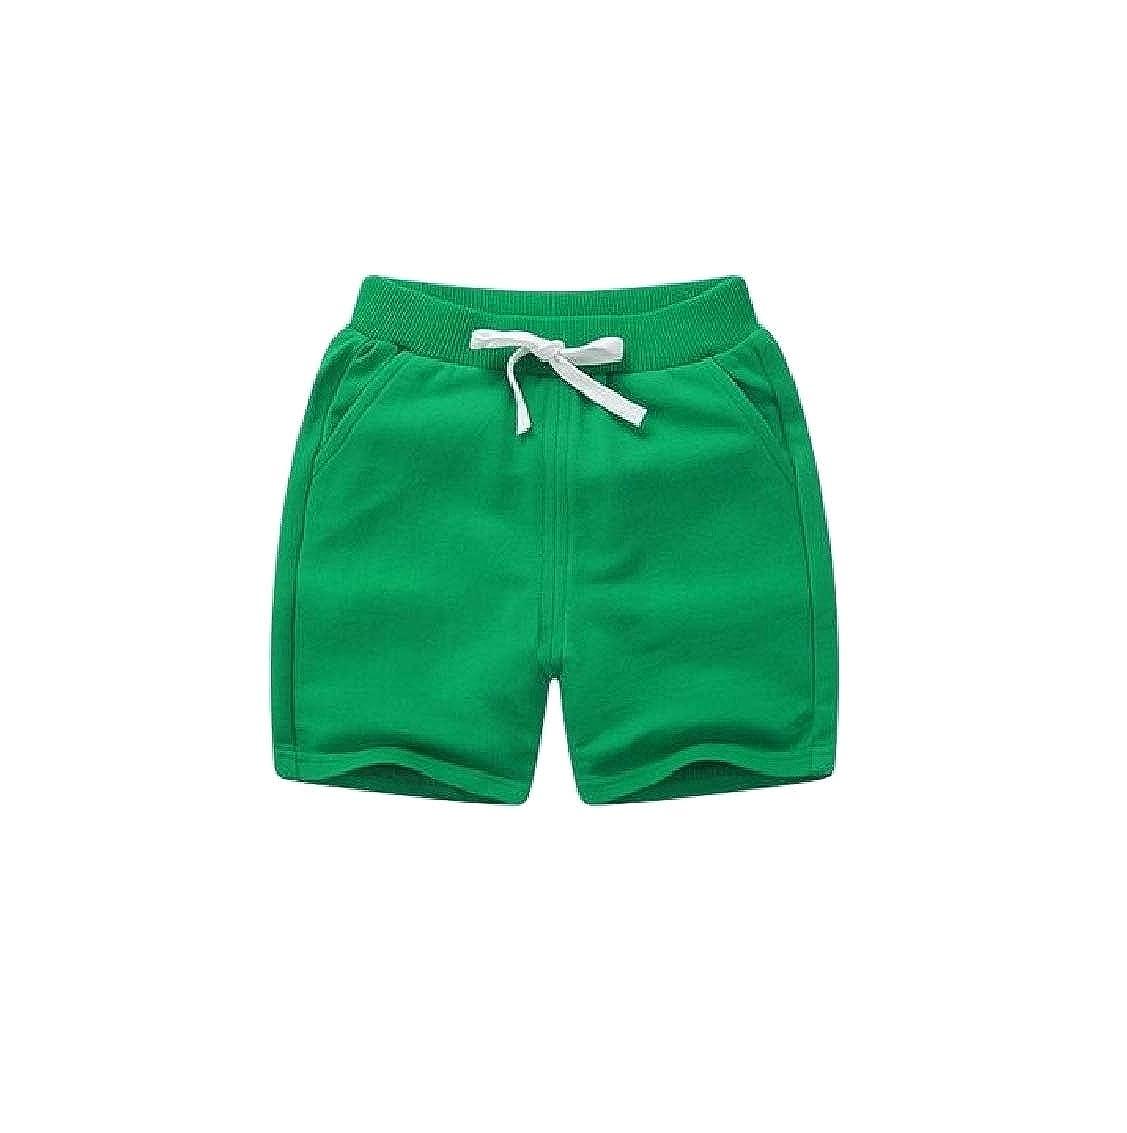 Sweatwater Girl Drawstring Sports Elastic Waist Boys Solid Shorts